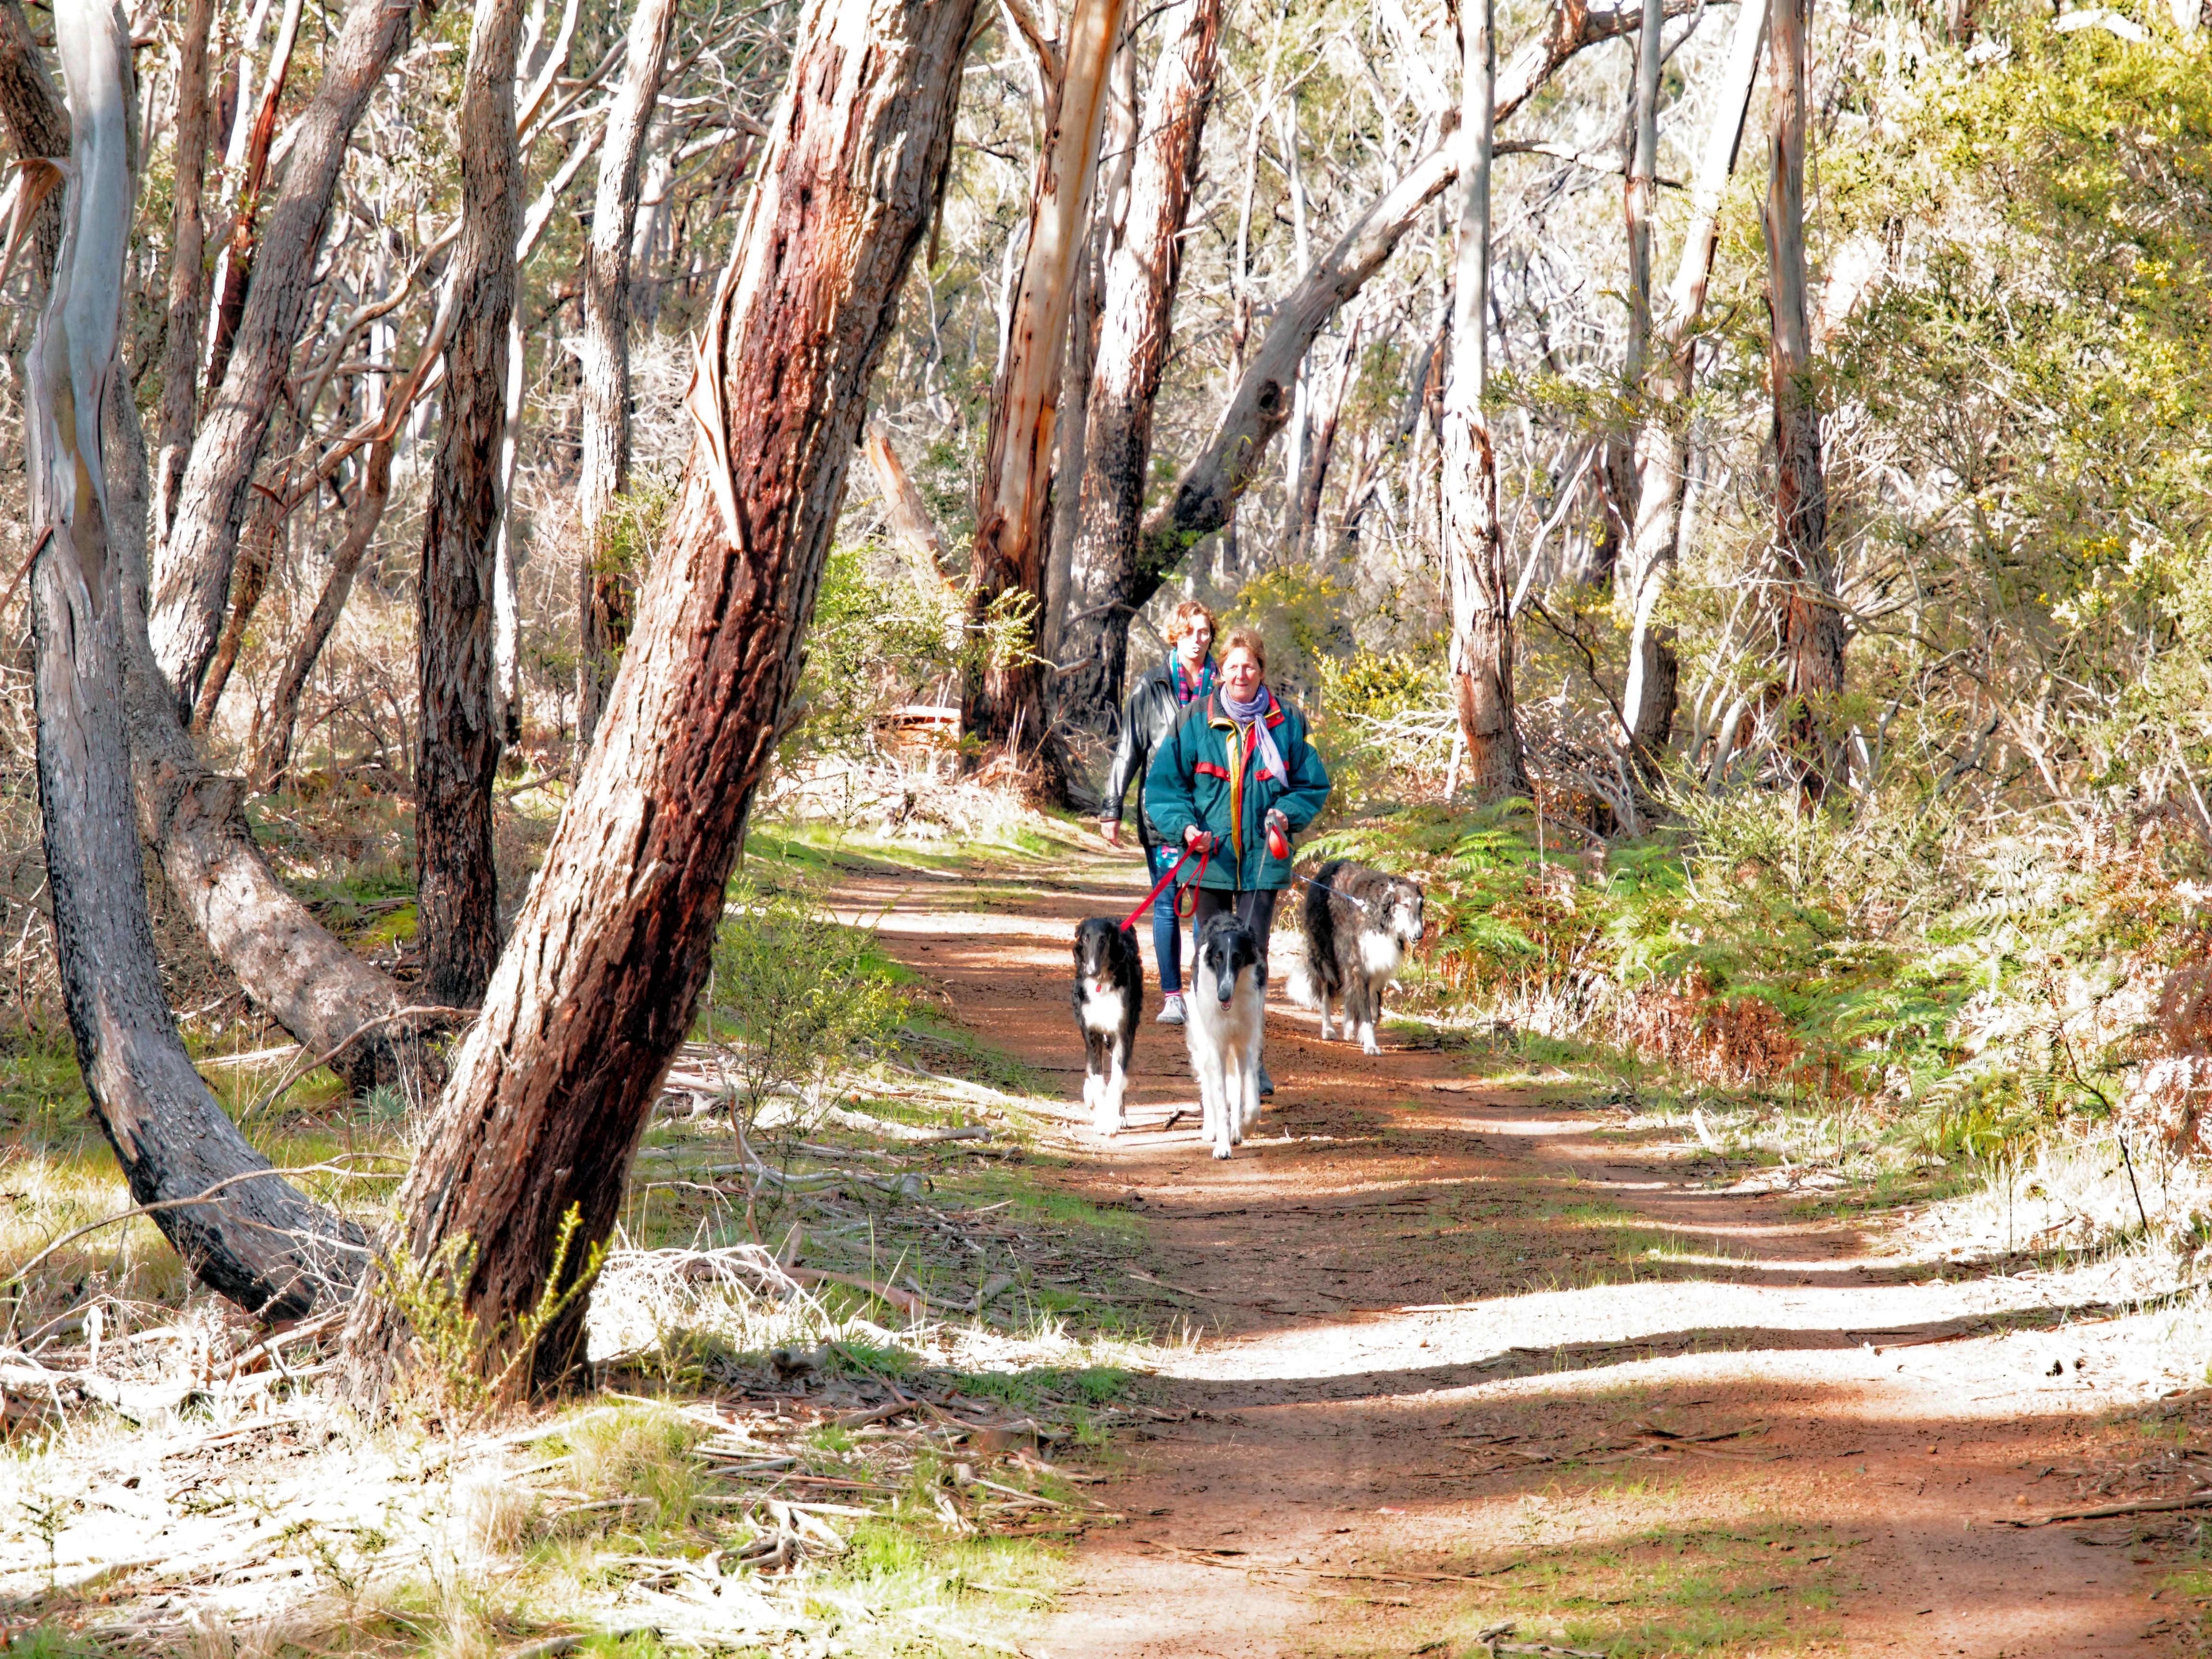 Walk-in-forest-26.jpeg